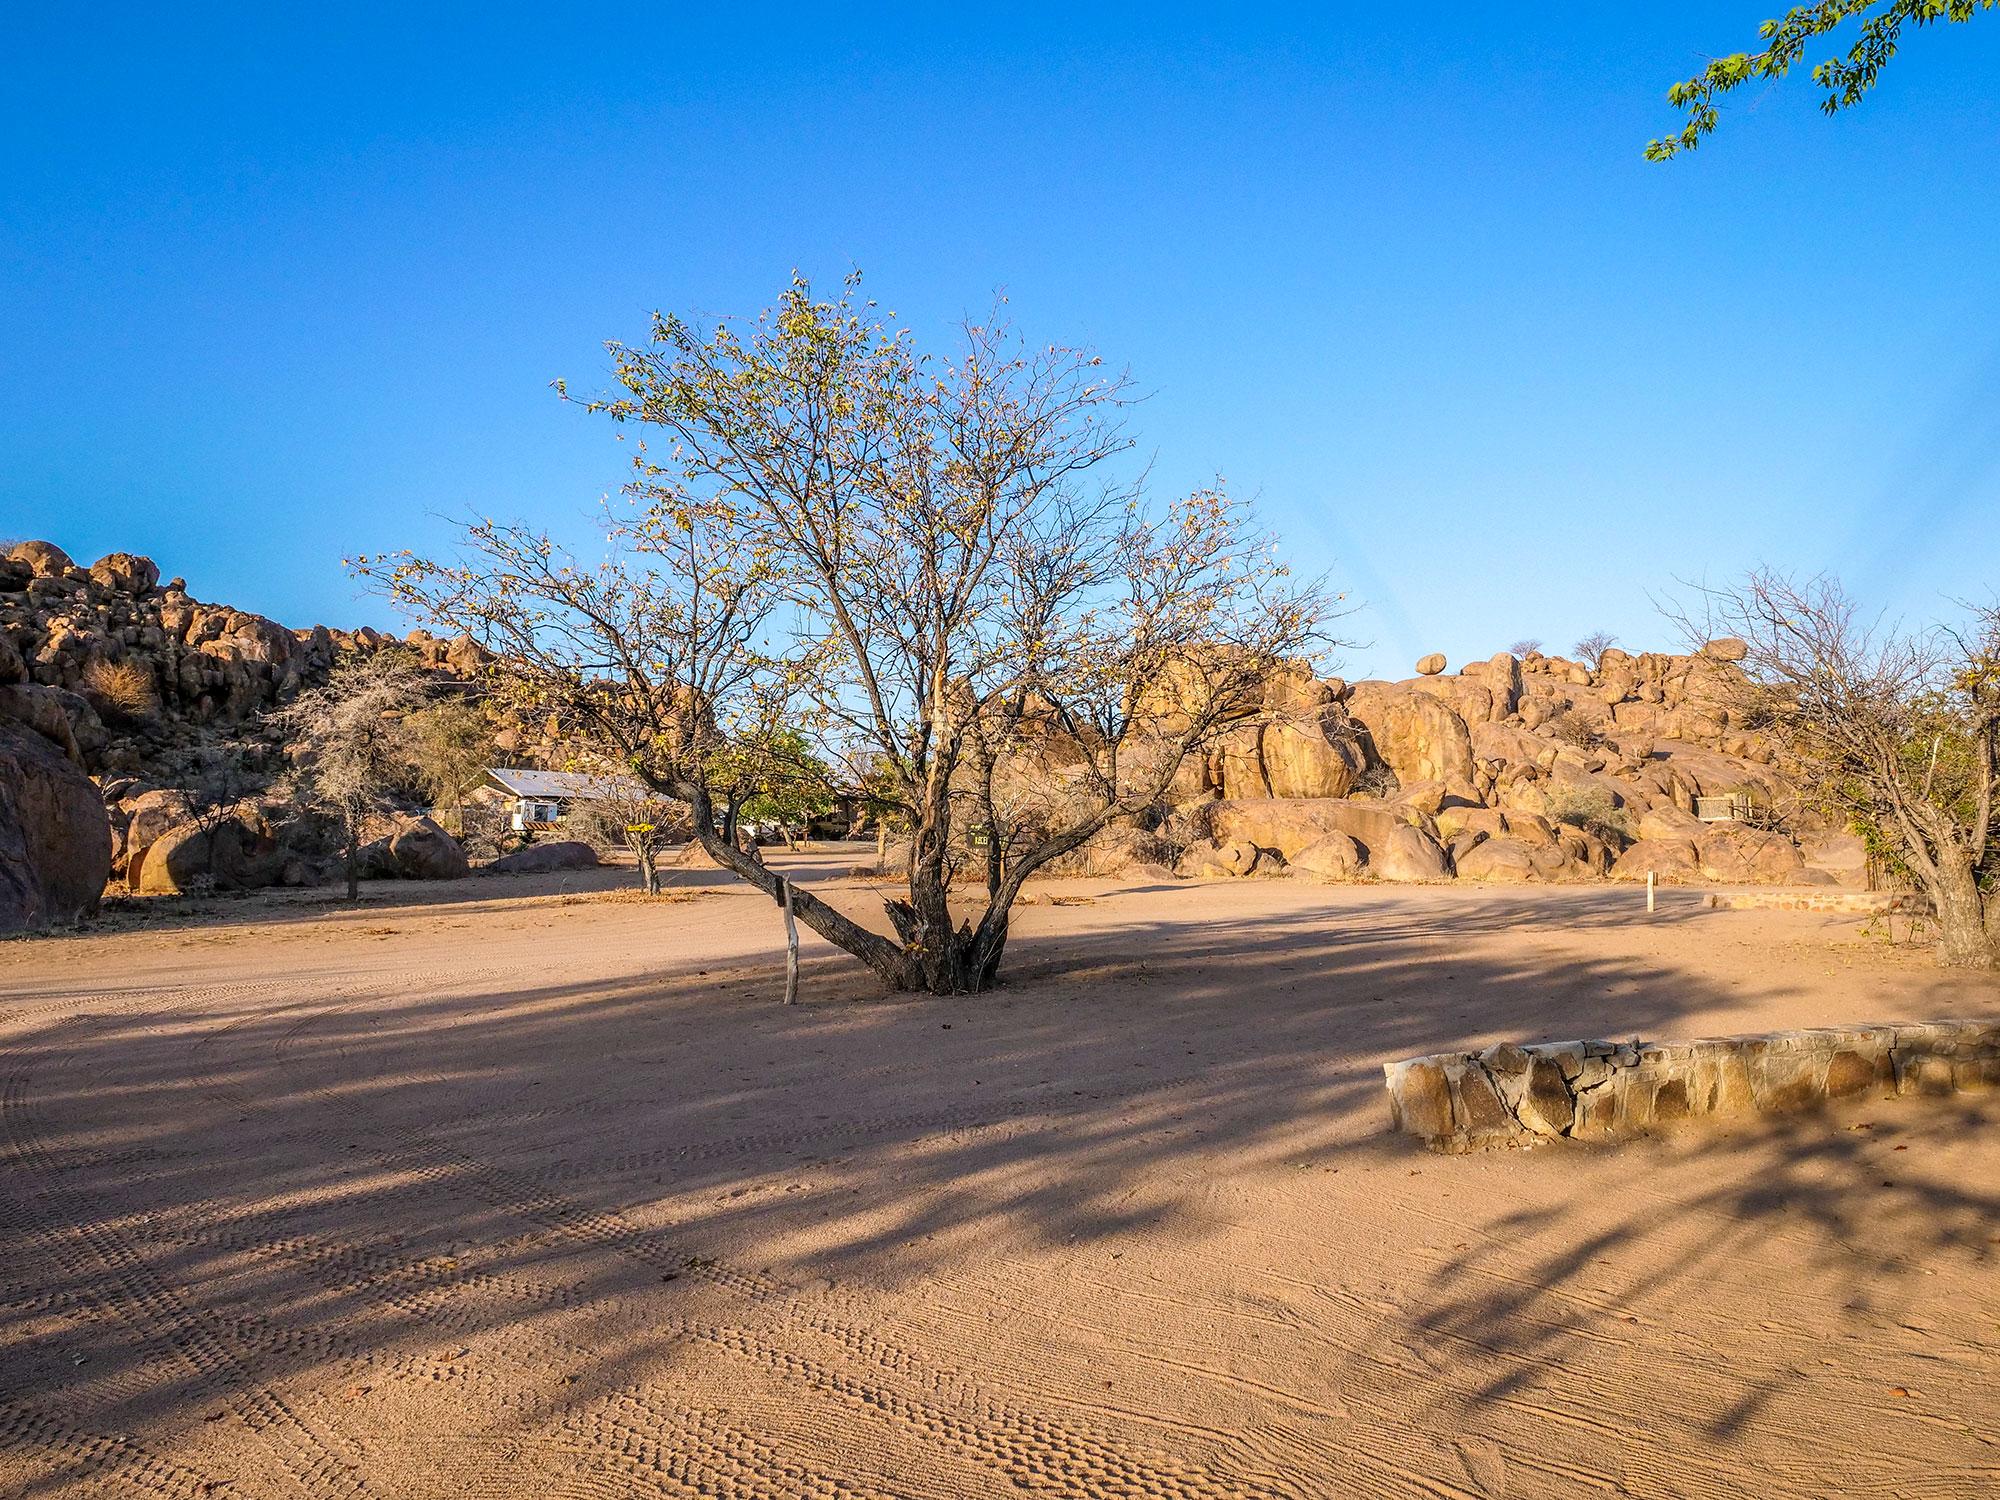 Madisa desert campsite in Damaraland in Namibia, Africa